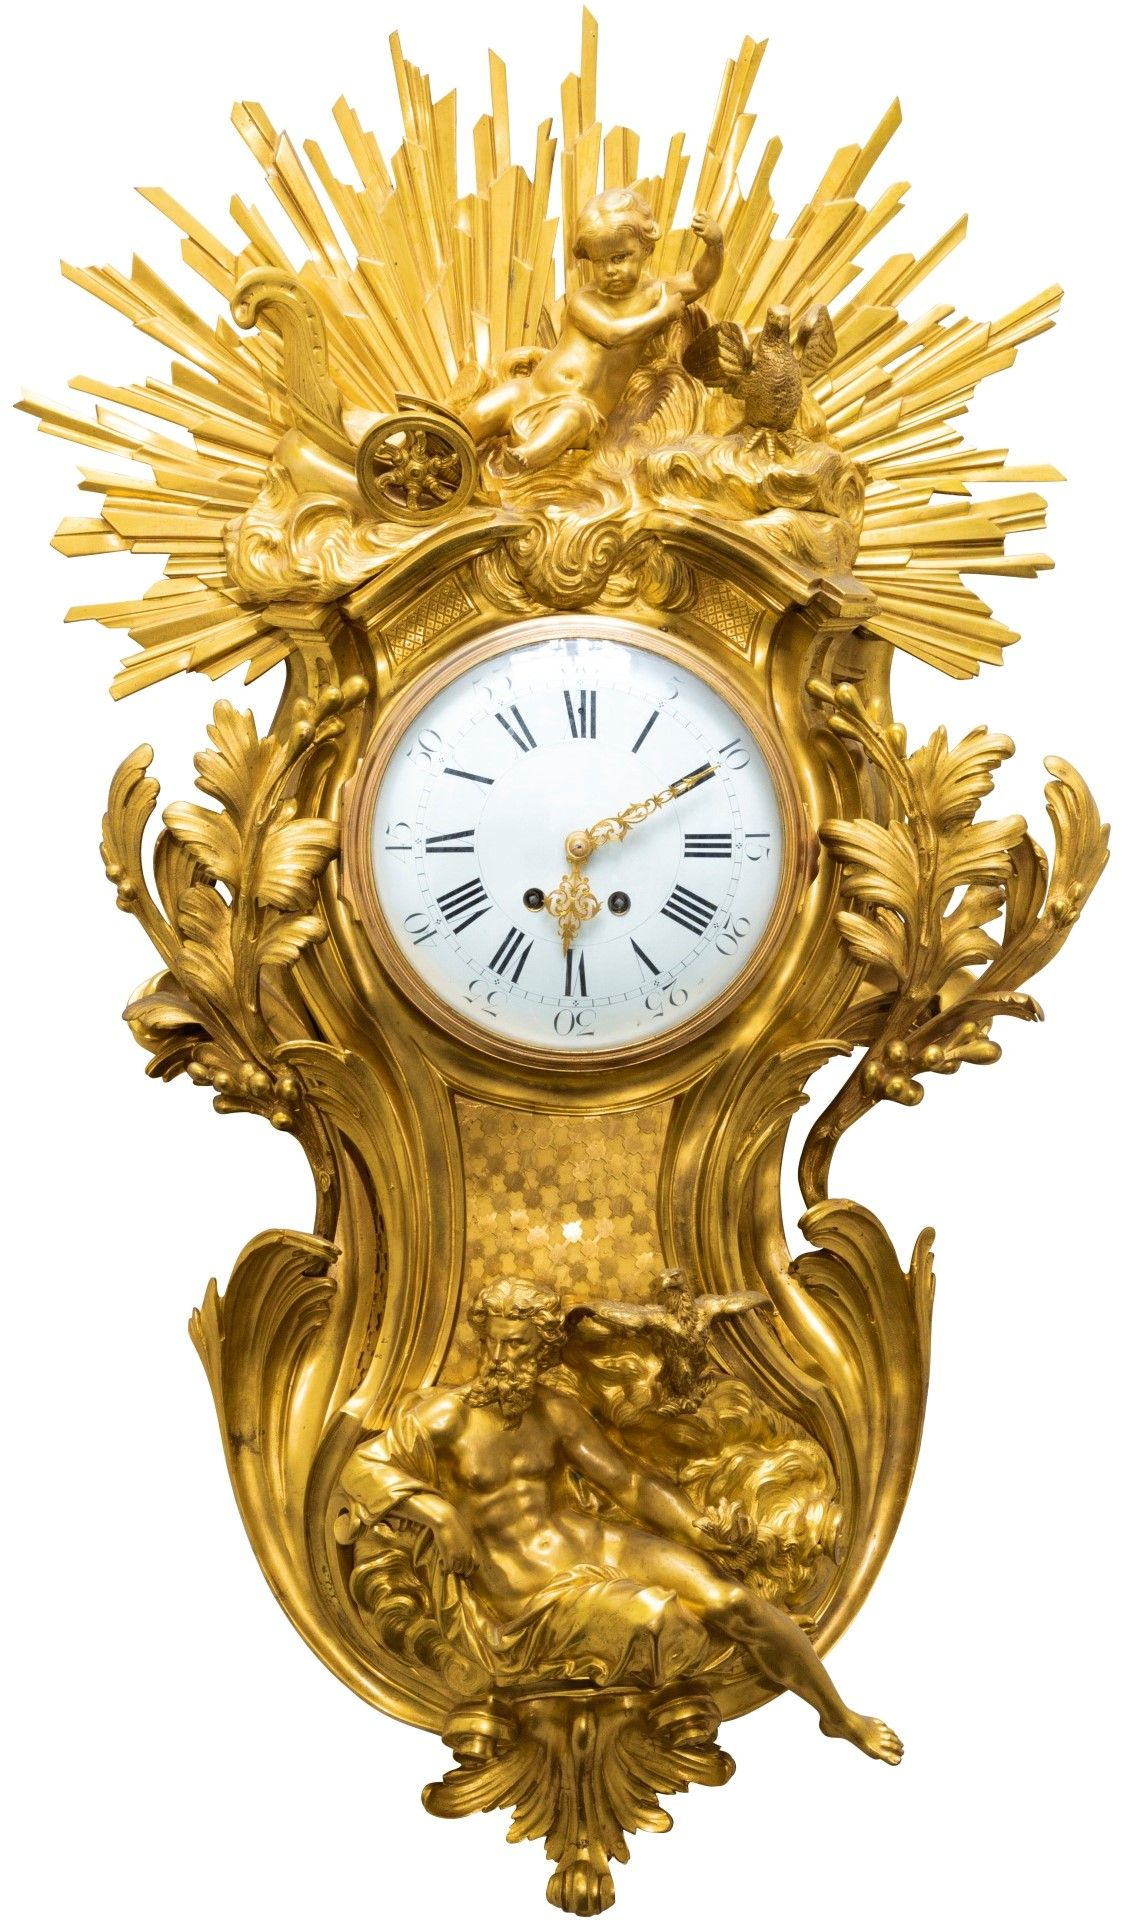 Pin by Jacqueline Parenteau on Clocks   Pinterest   Clock ideas and ...